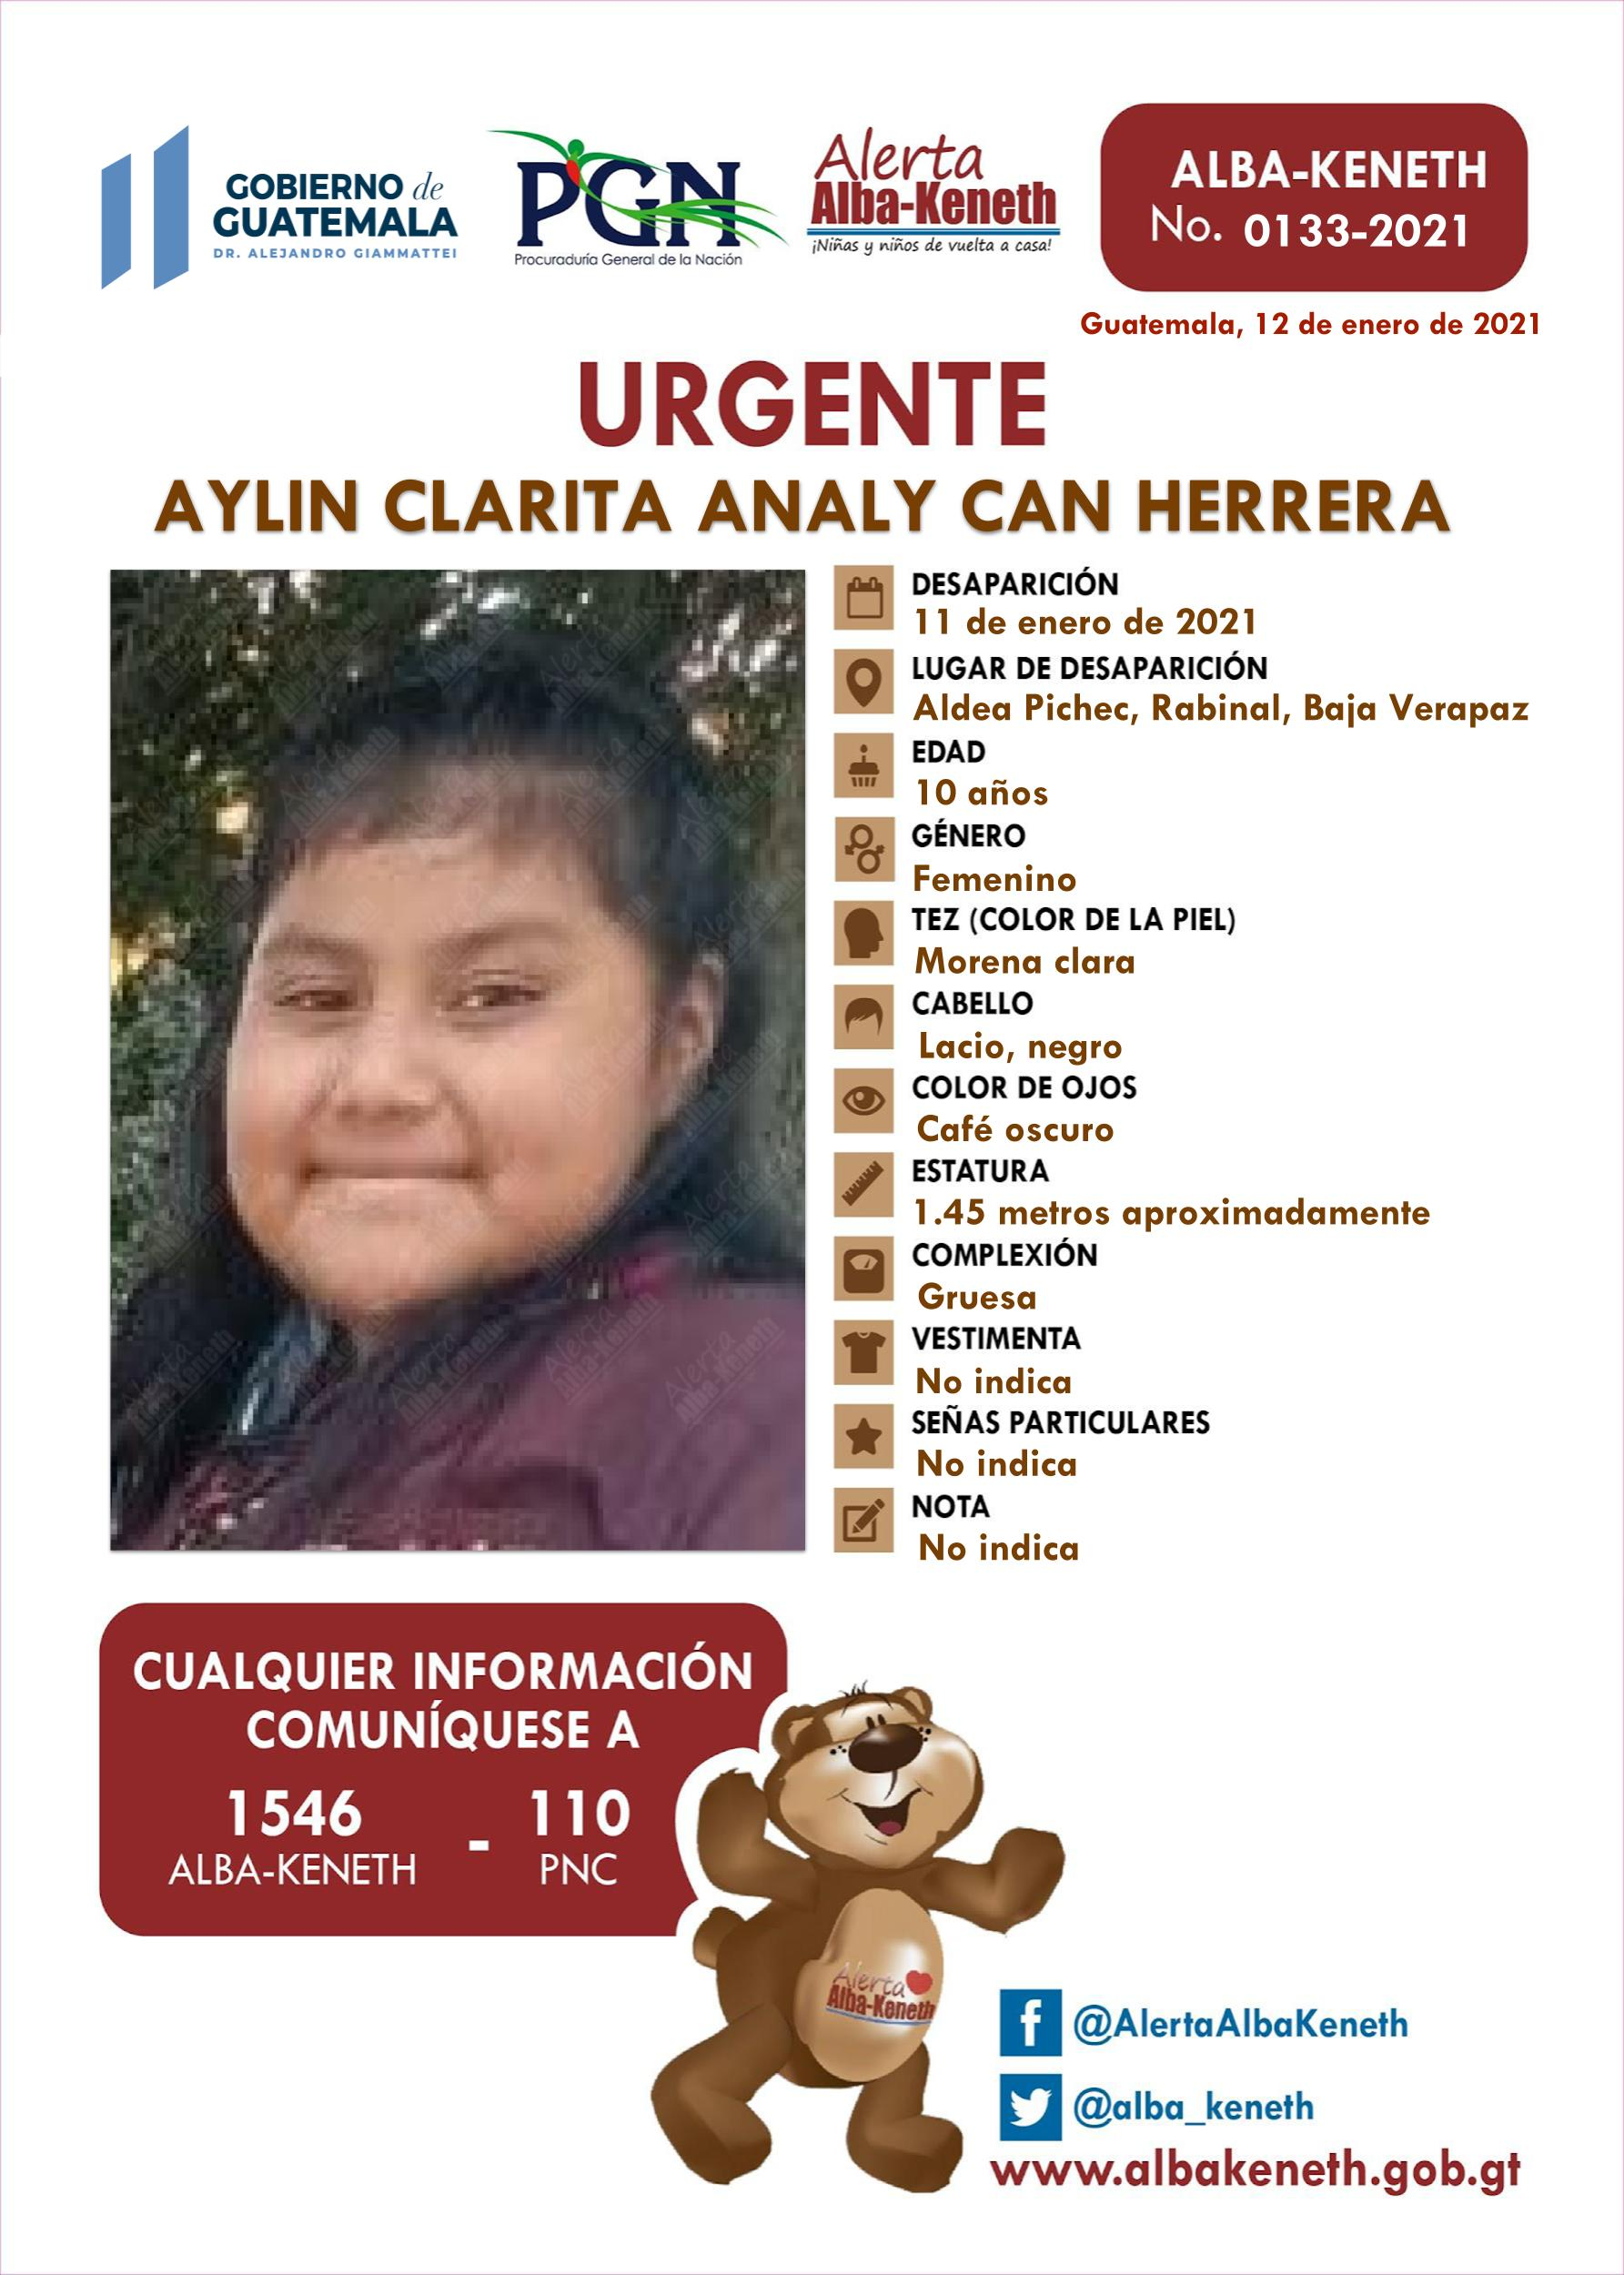 Aylin Clarita Analy Can Herrera